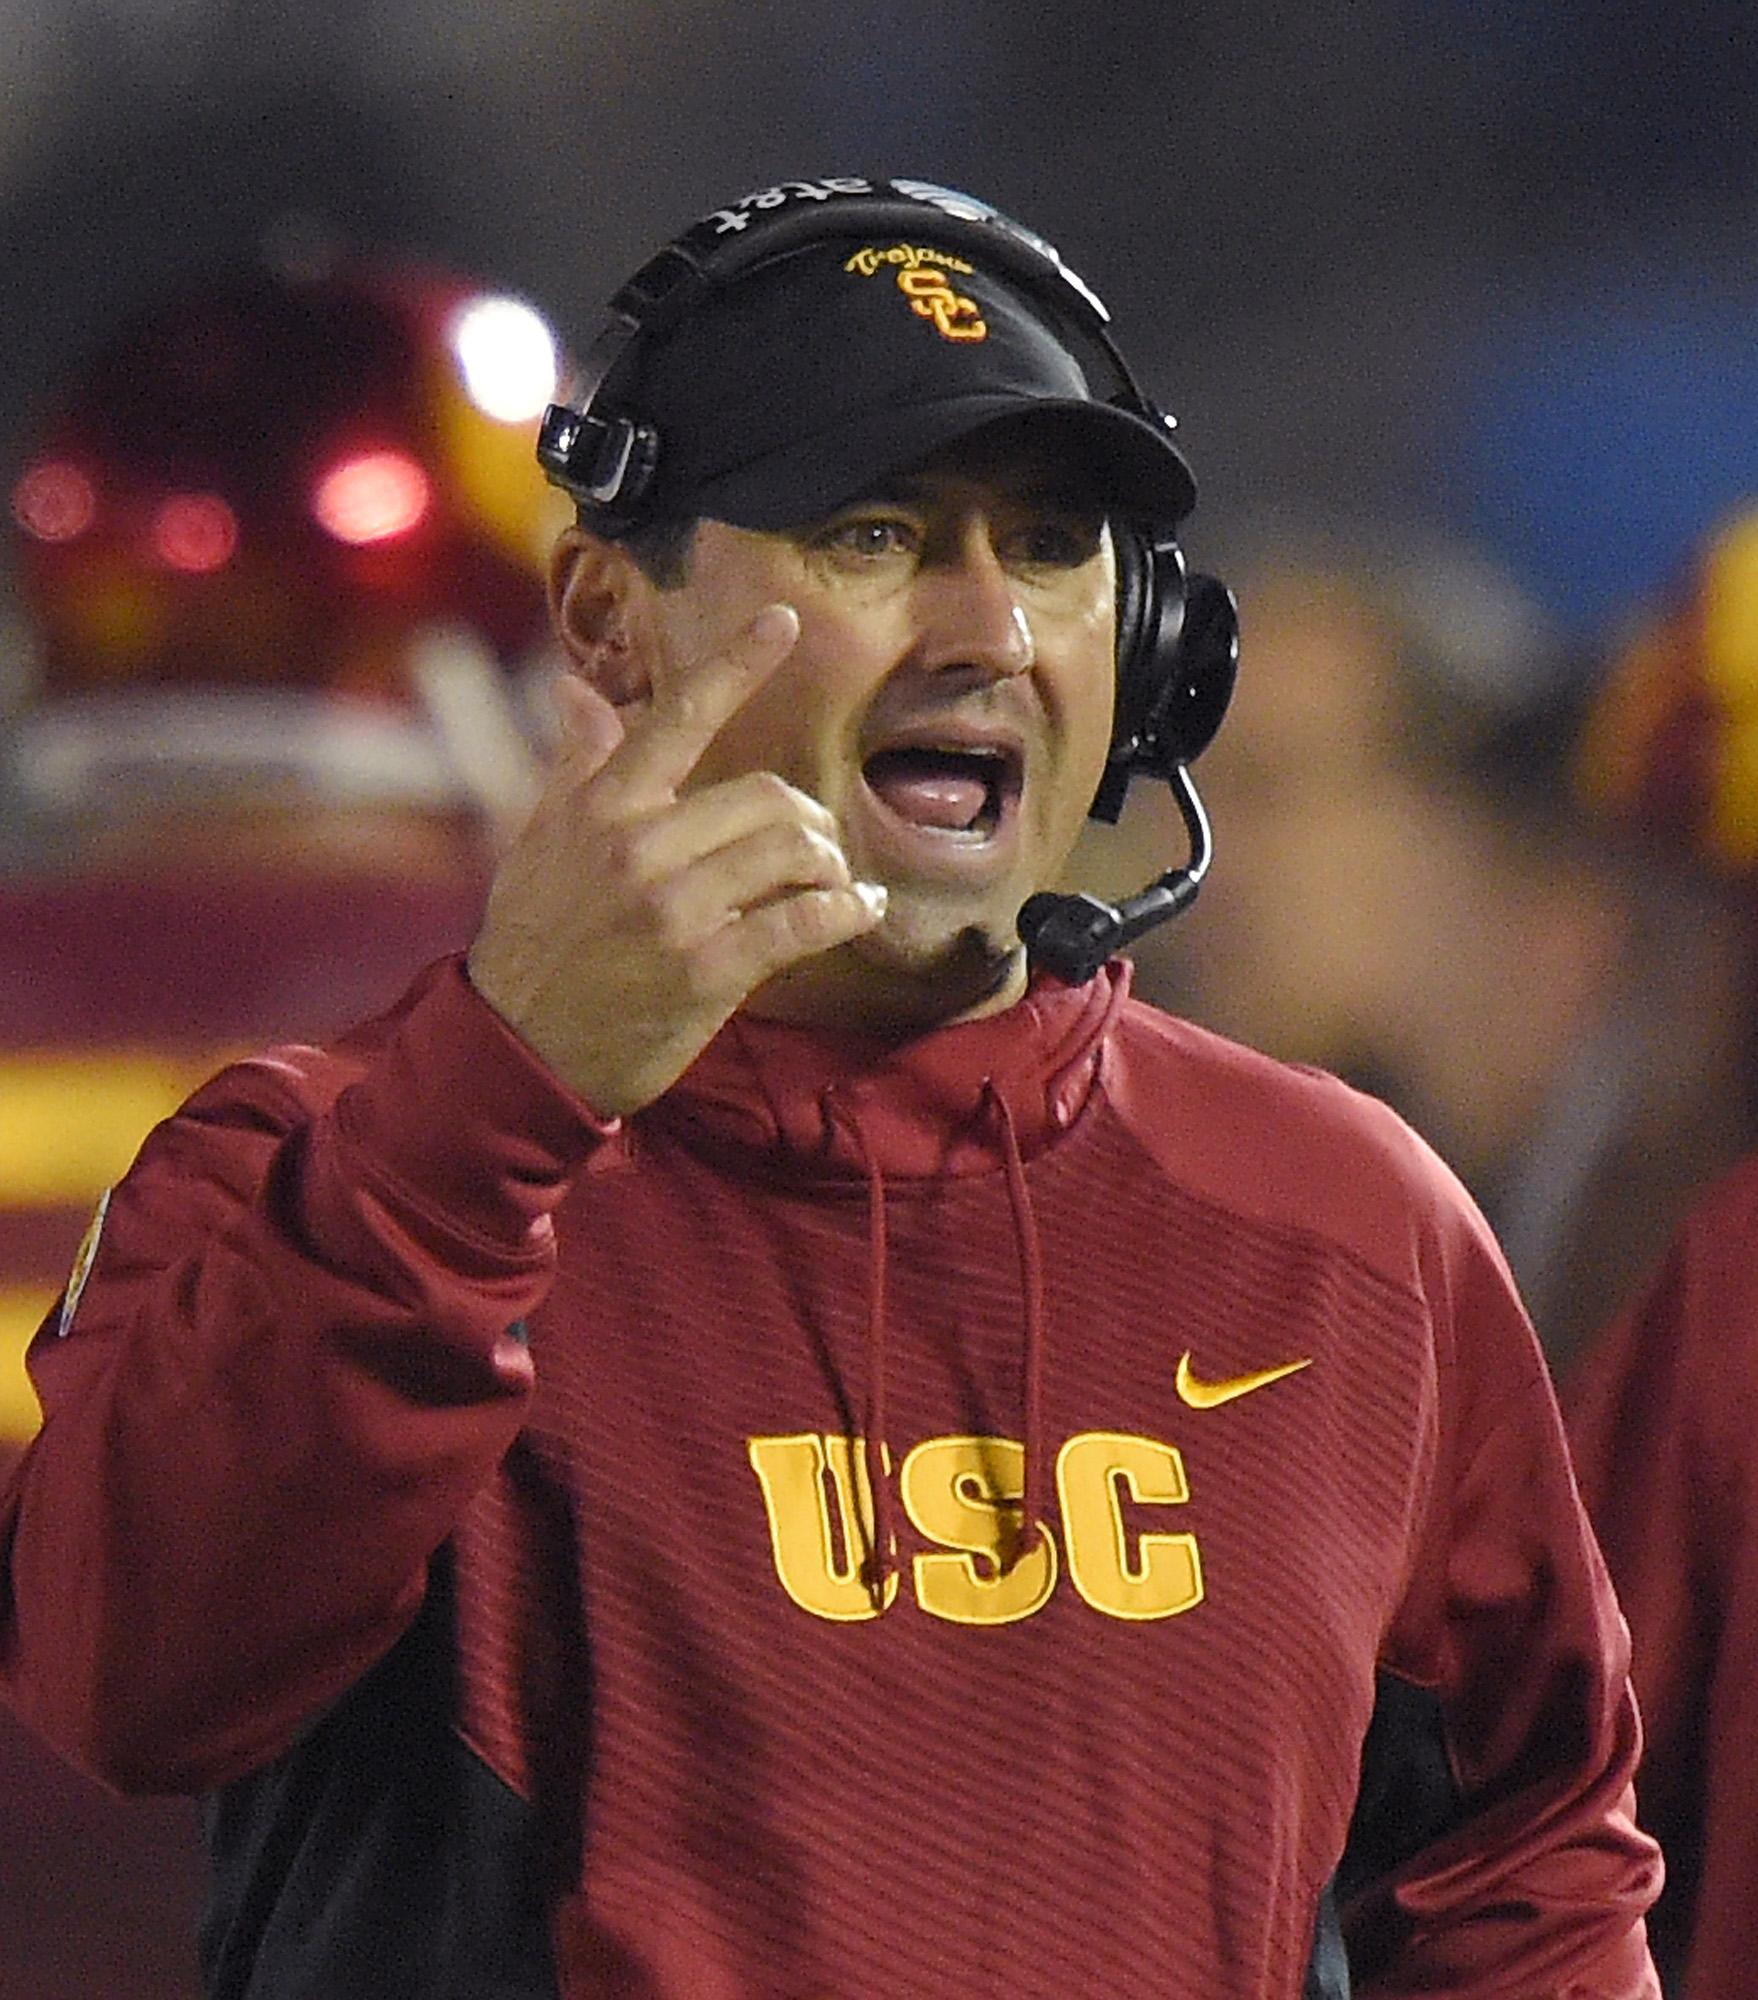 Southern California head coach Steve Sarkisian gestures during the first half of an NCAA college football game against UCLA, Saturday, Nov. 22, 2014, in Pasadena, Calif. (AP Photo/Mark J. Terrill)